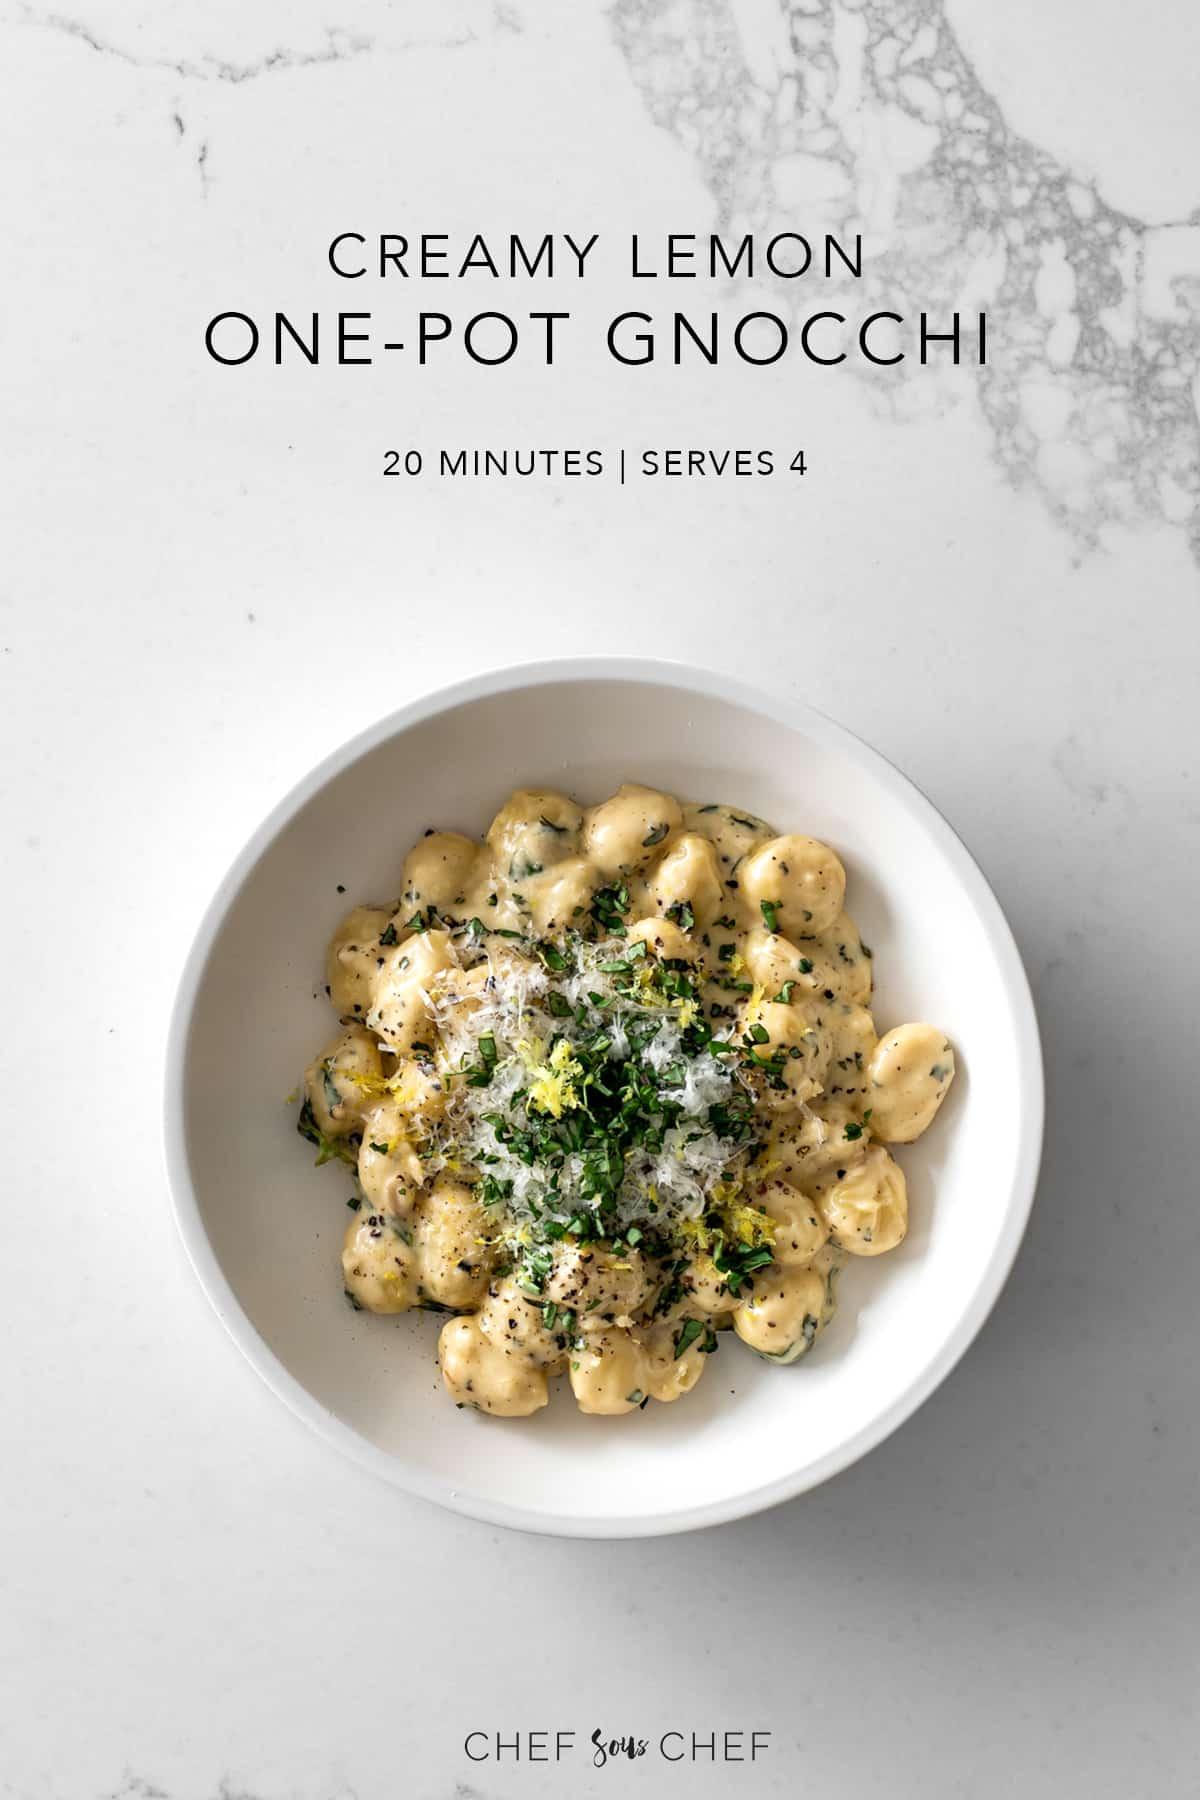 Creamy Lemon One-Pot Gnocchi Pinterest Image